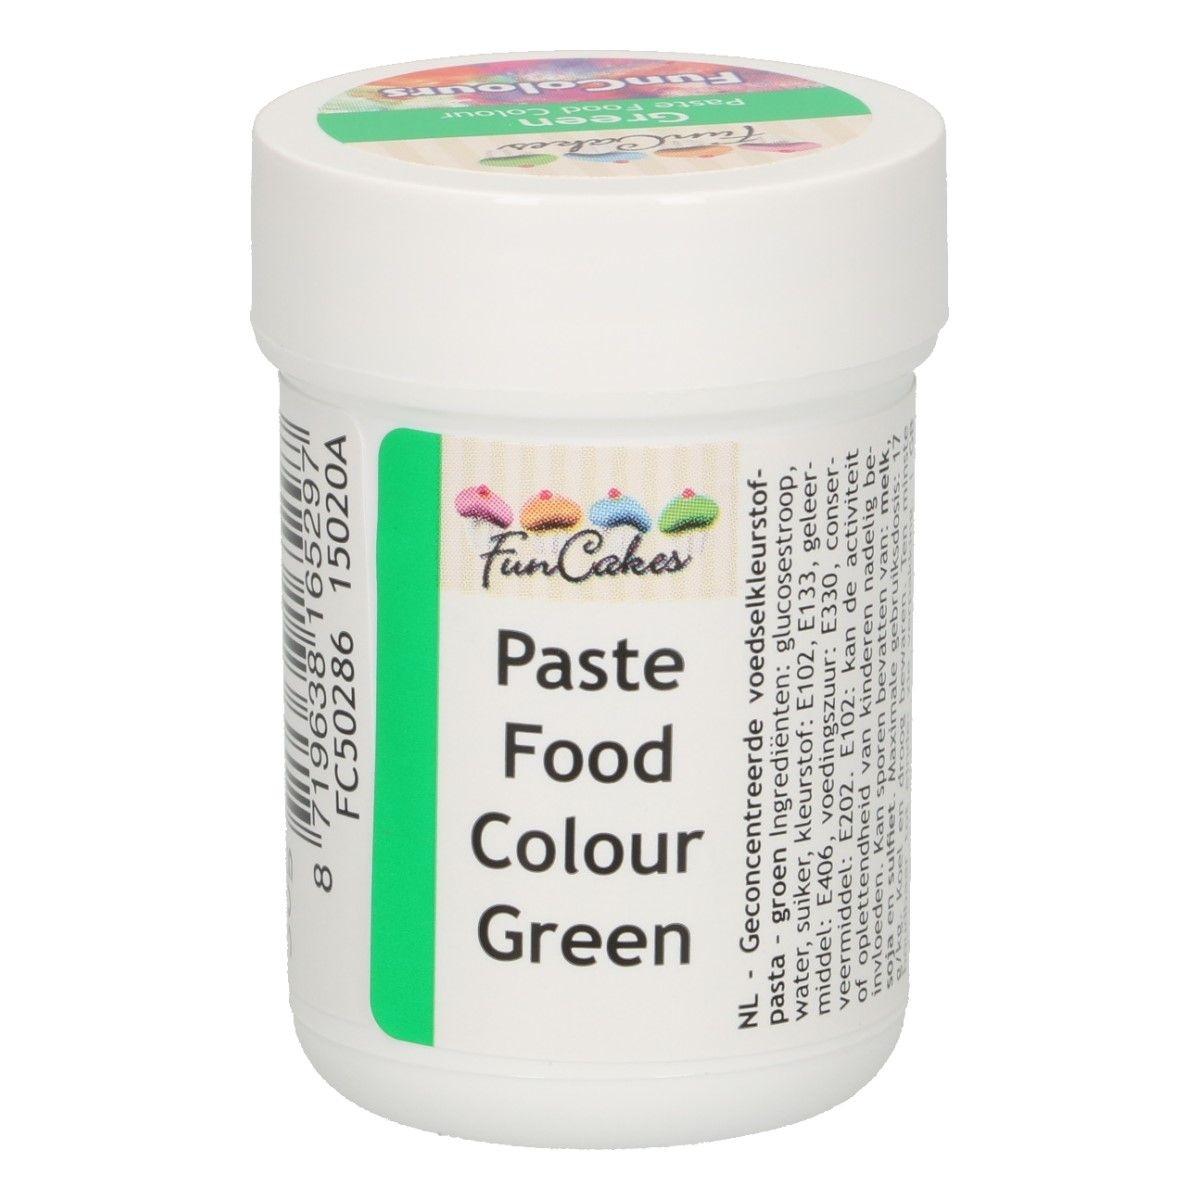 /f/u/funcakes_funcolours_paste_food_colour_-_green.jpg